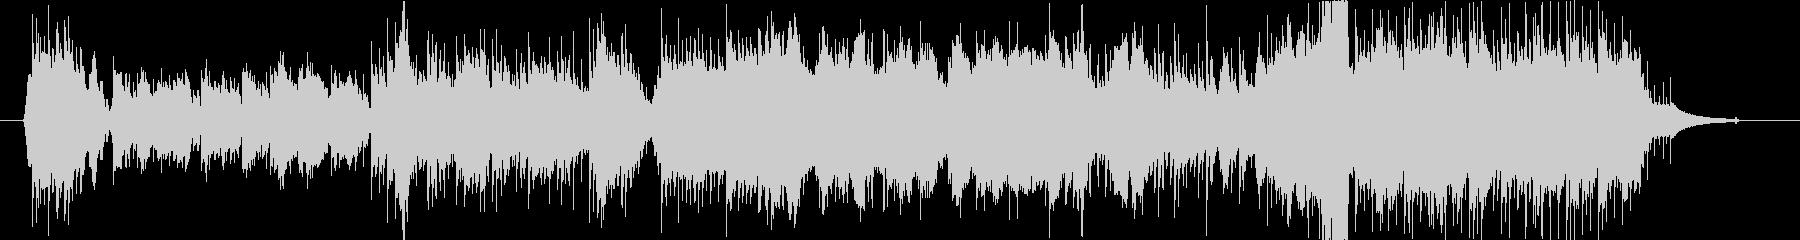 Theme(「幸色のワンルーム」背景音楽)の未再生の波形